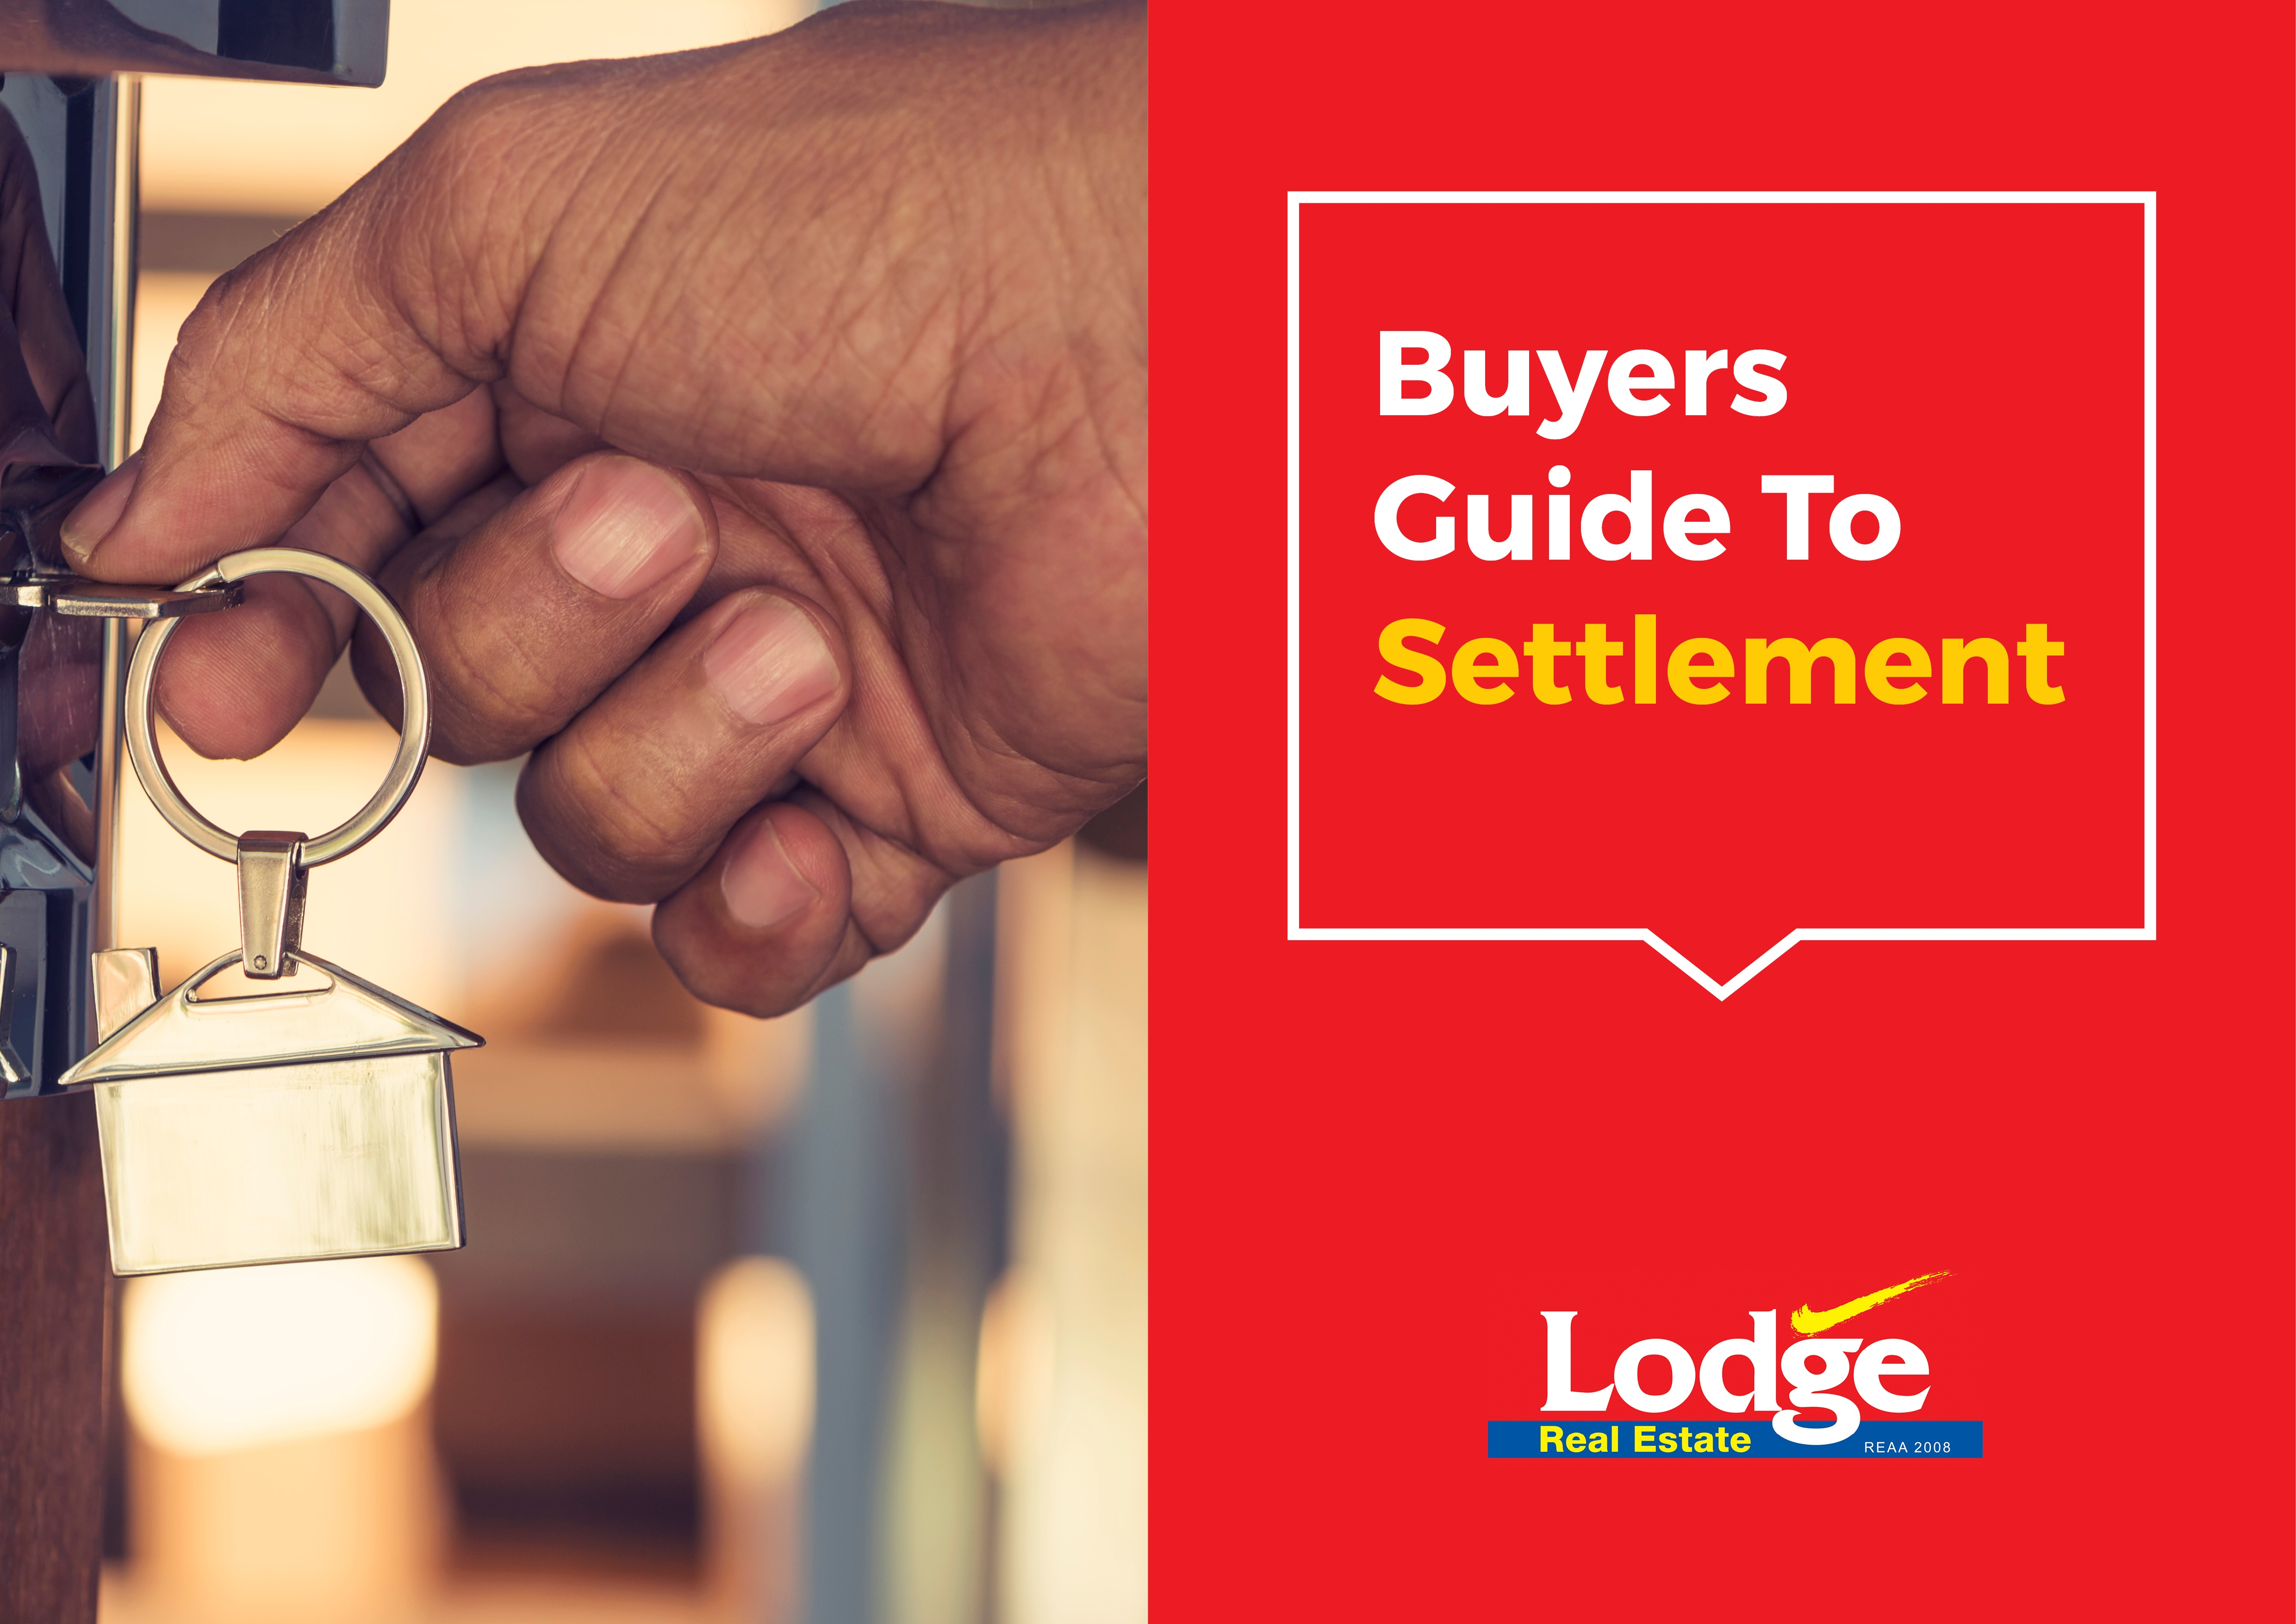 Buyers Guide To Settlement Ebook.jpg